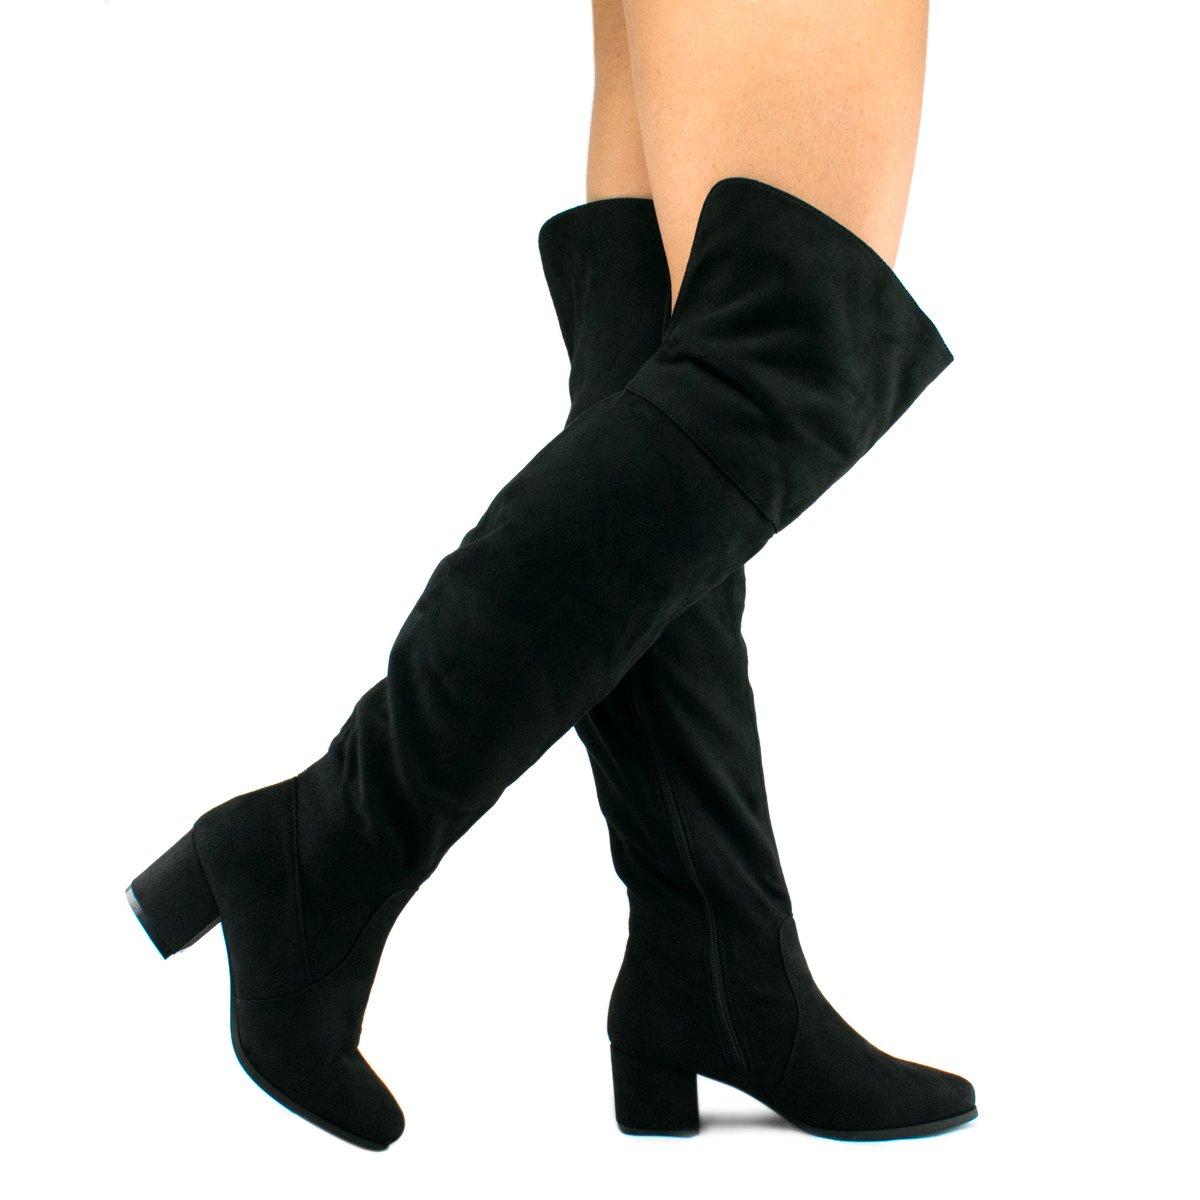 Women's Over The Knee Stretch Boot - Trendy Low Block Heel Shoe - Sexy Over The Knee Pullon Boot - Comfortable Easy Heel Boot, TPS Linden-01 v4 Black Size 6